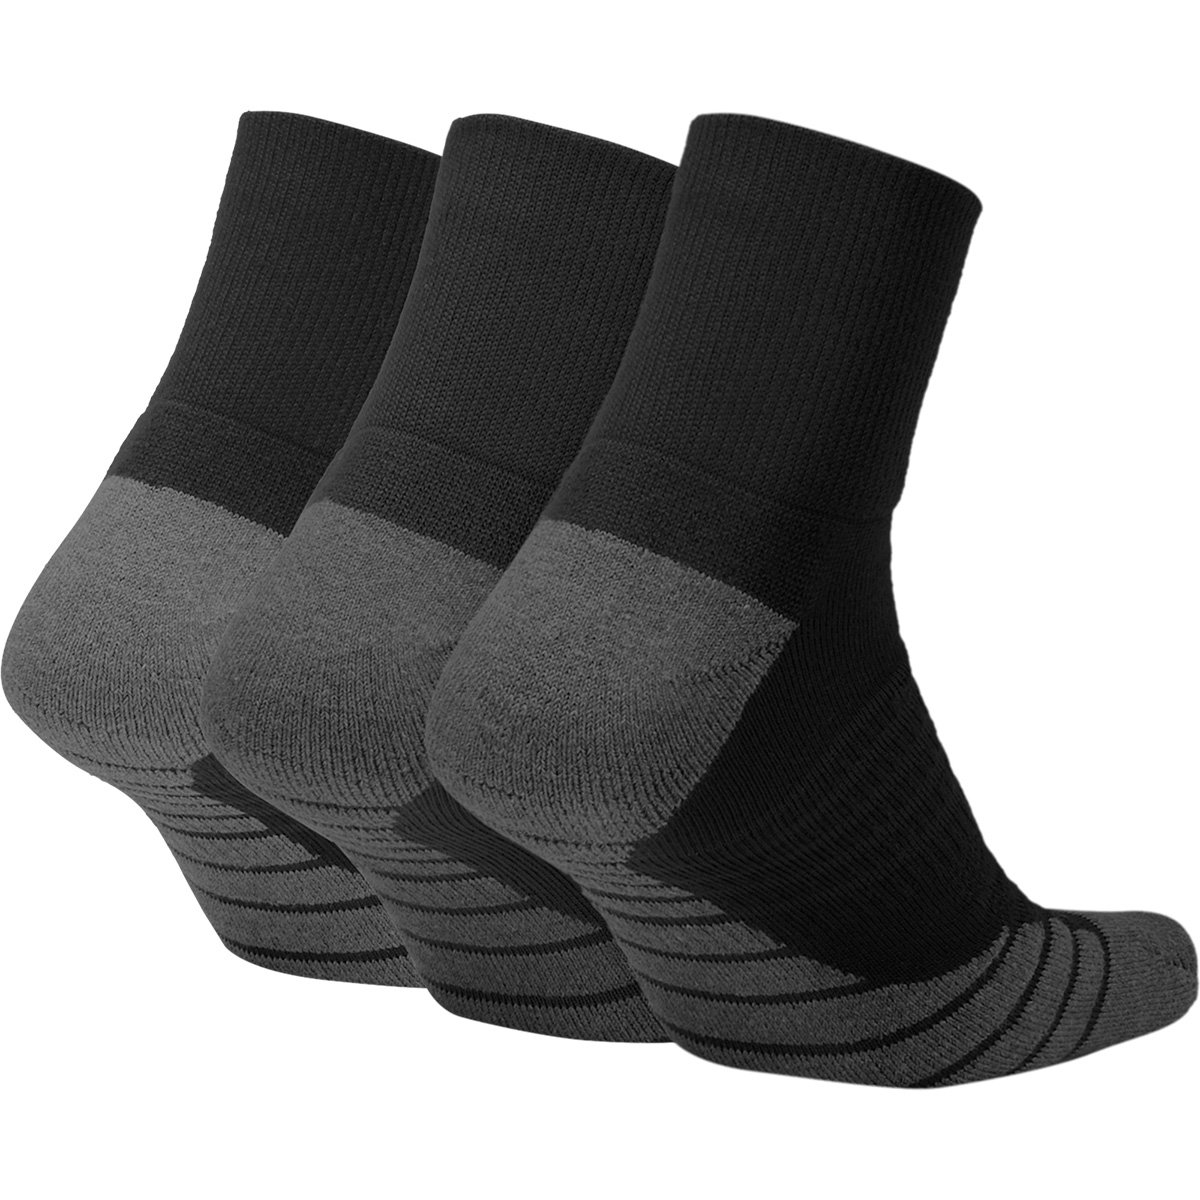 c31107e7b Kit Meia Nike Dri-Fit Cushion 3 Pares - Compre Agora